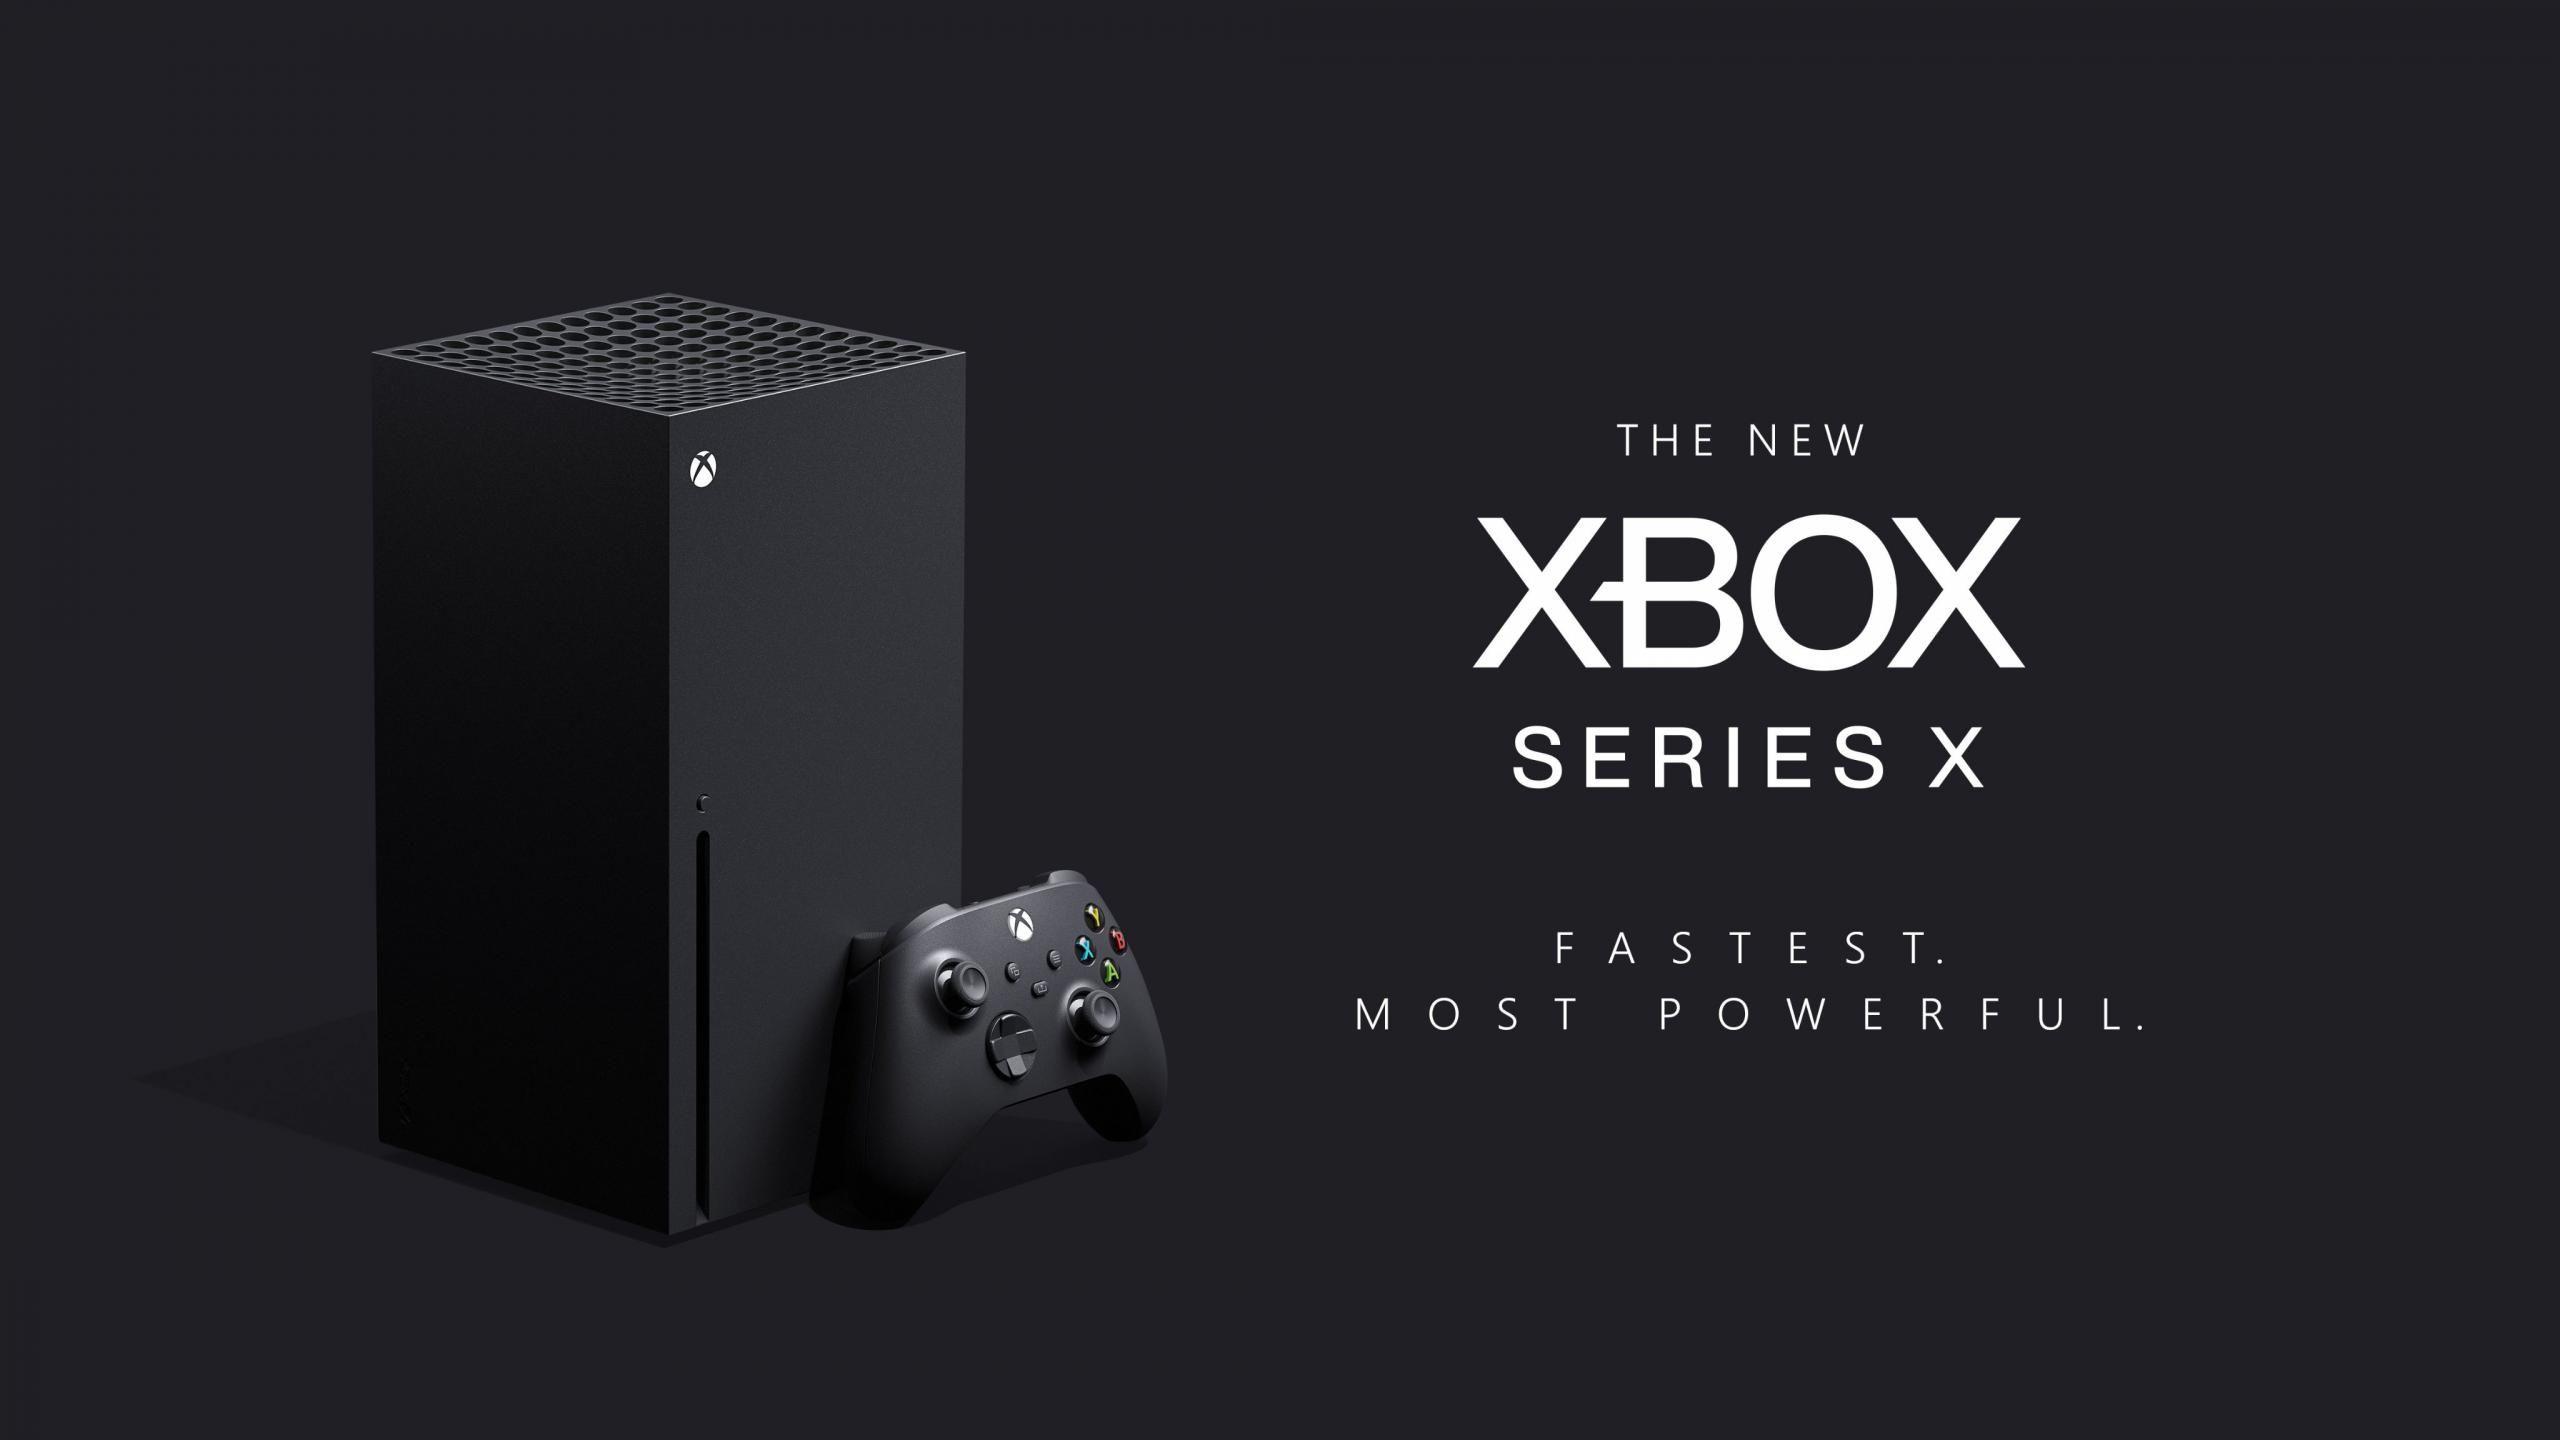 Microsoft reveals Xbox Series X, fastest, most powerful